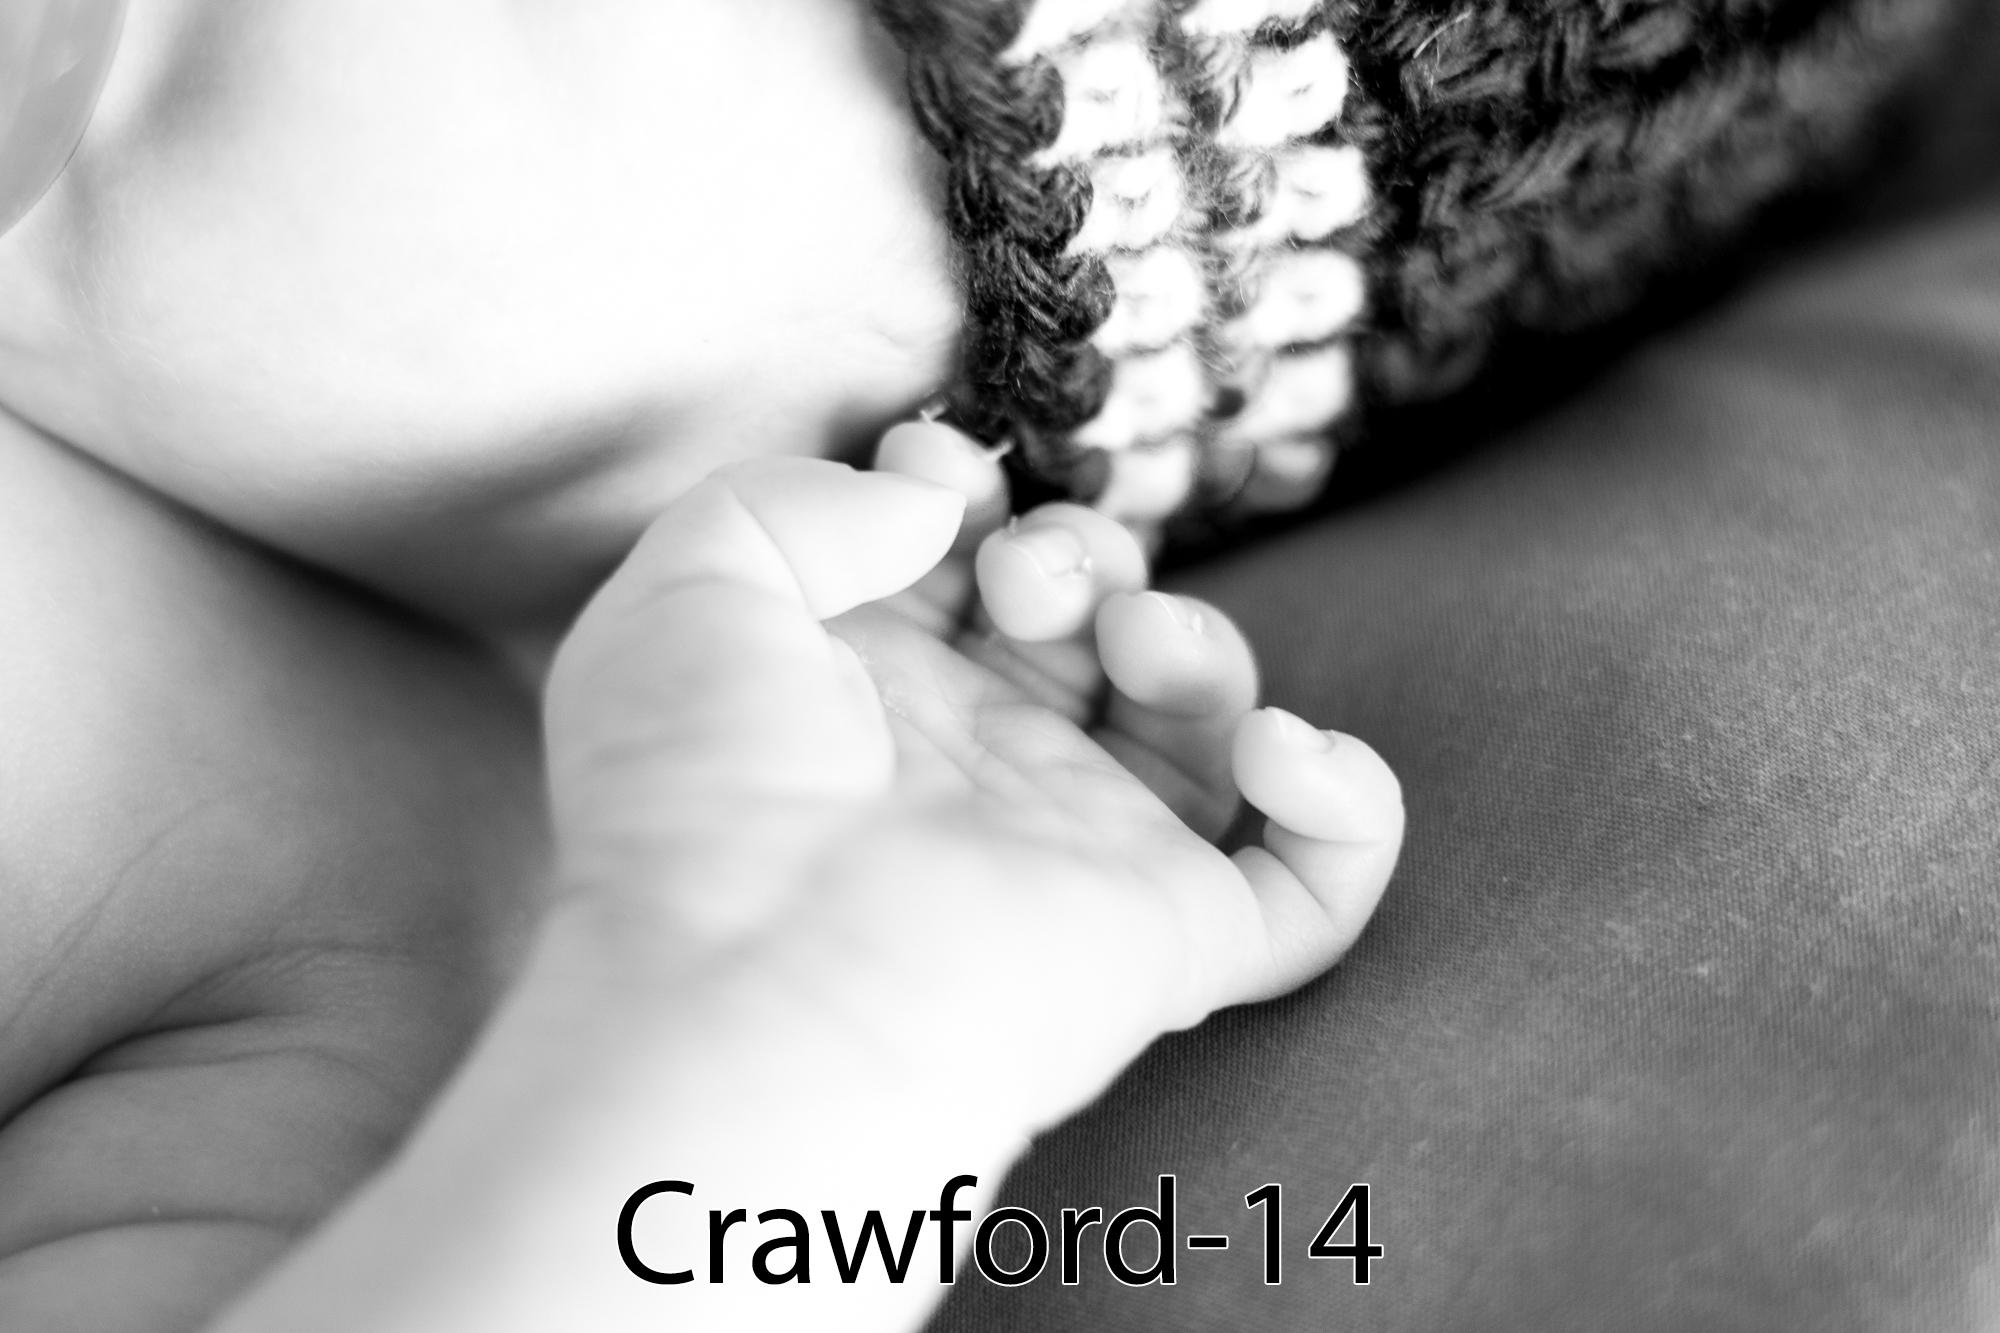 Crawford-14.jpg